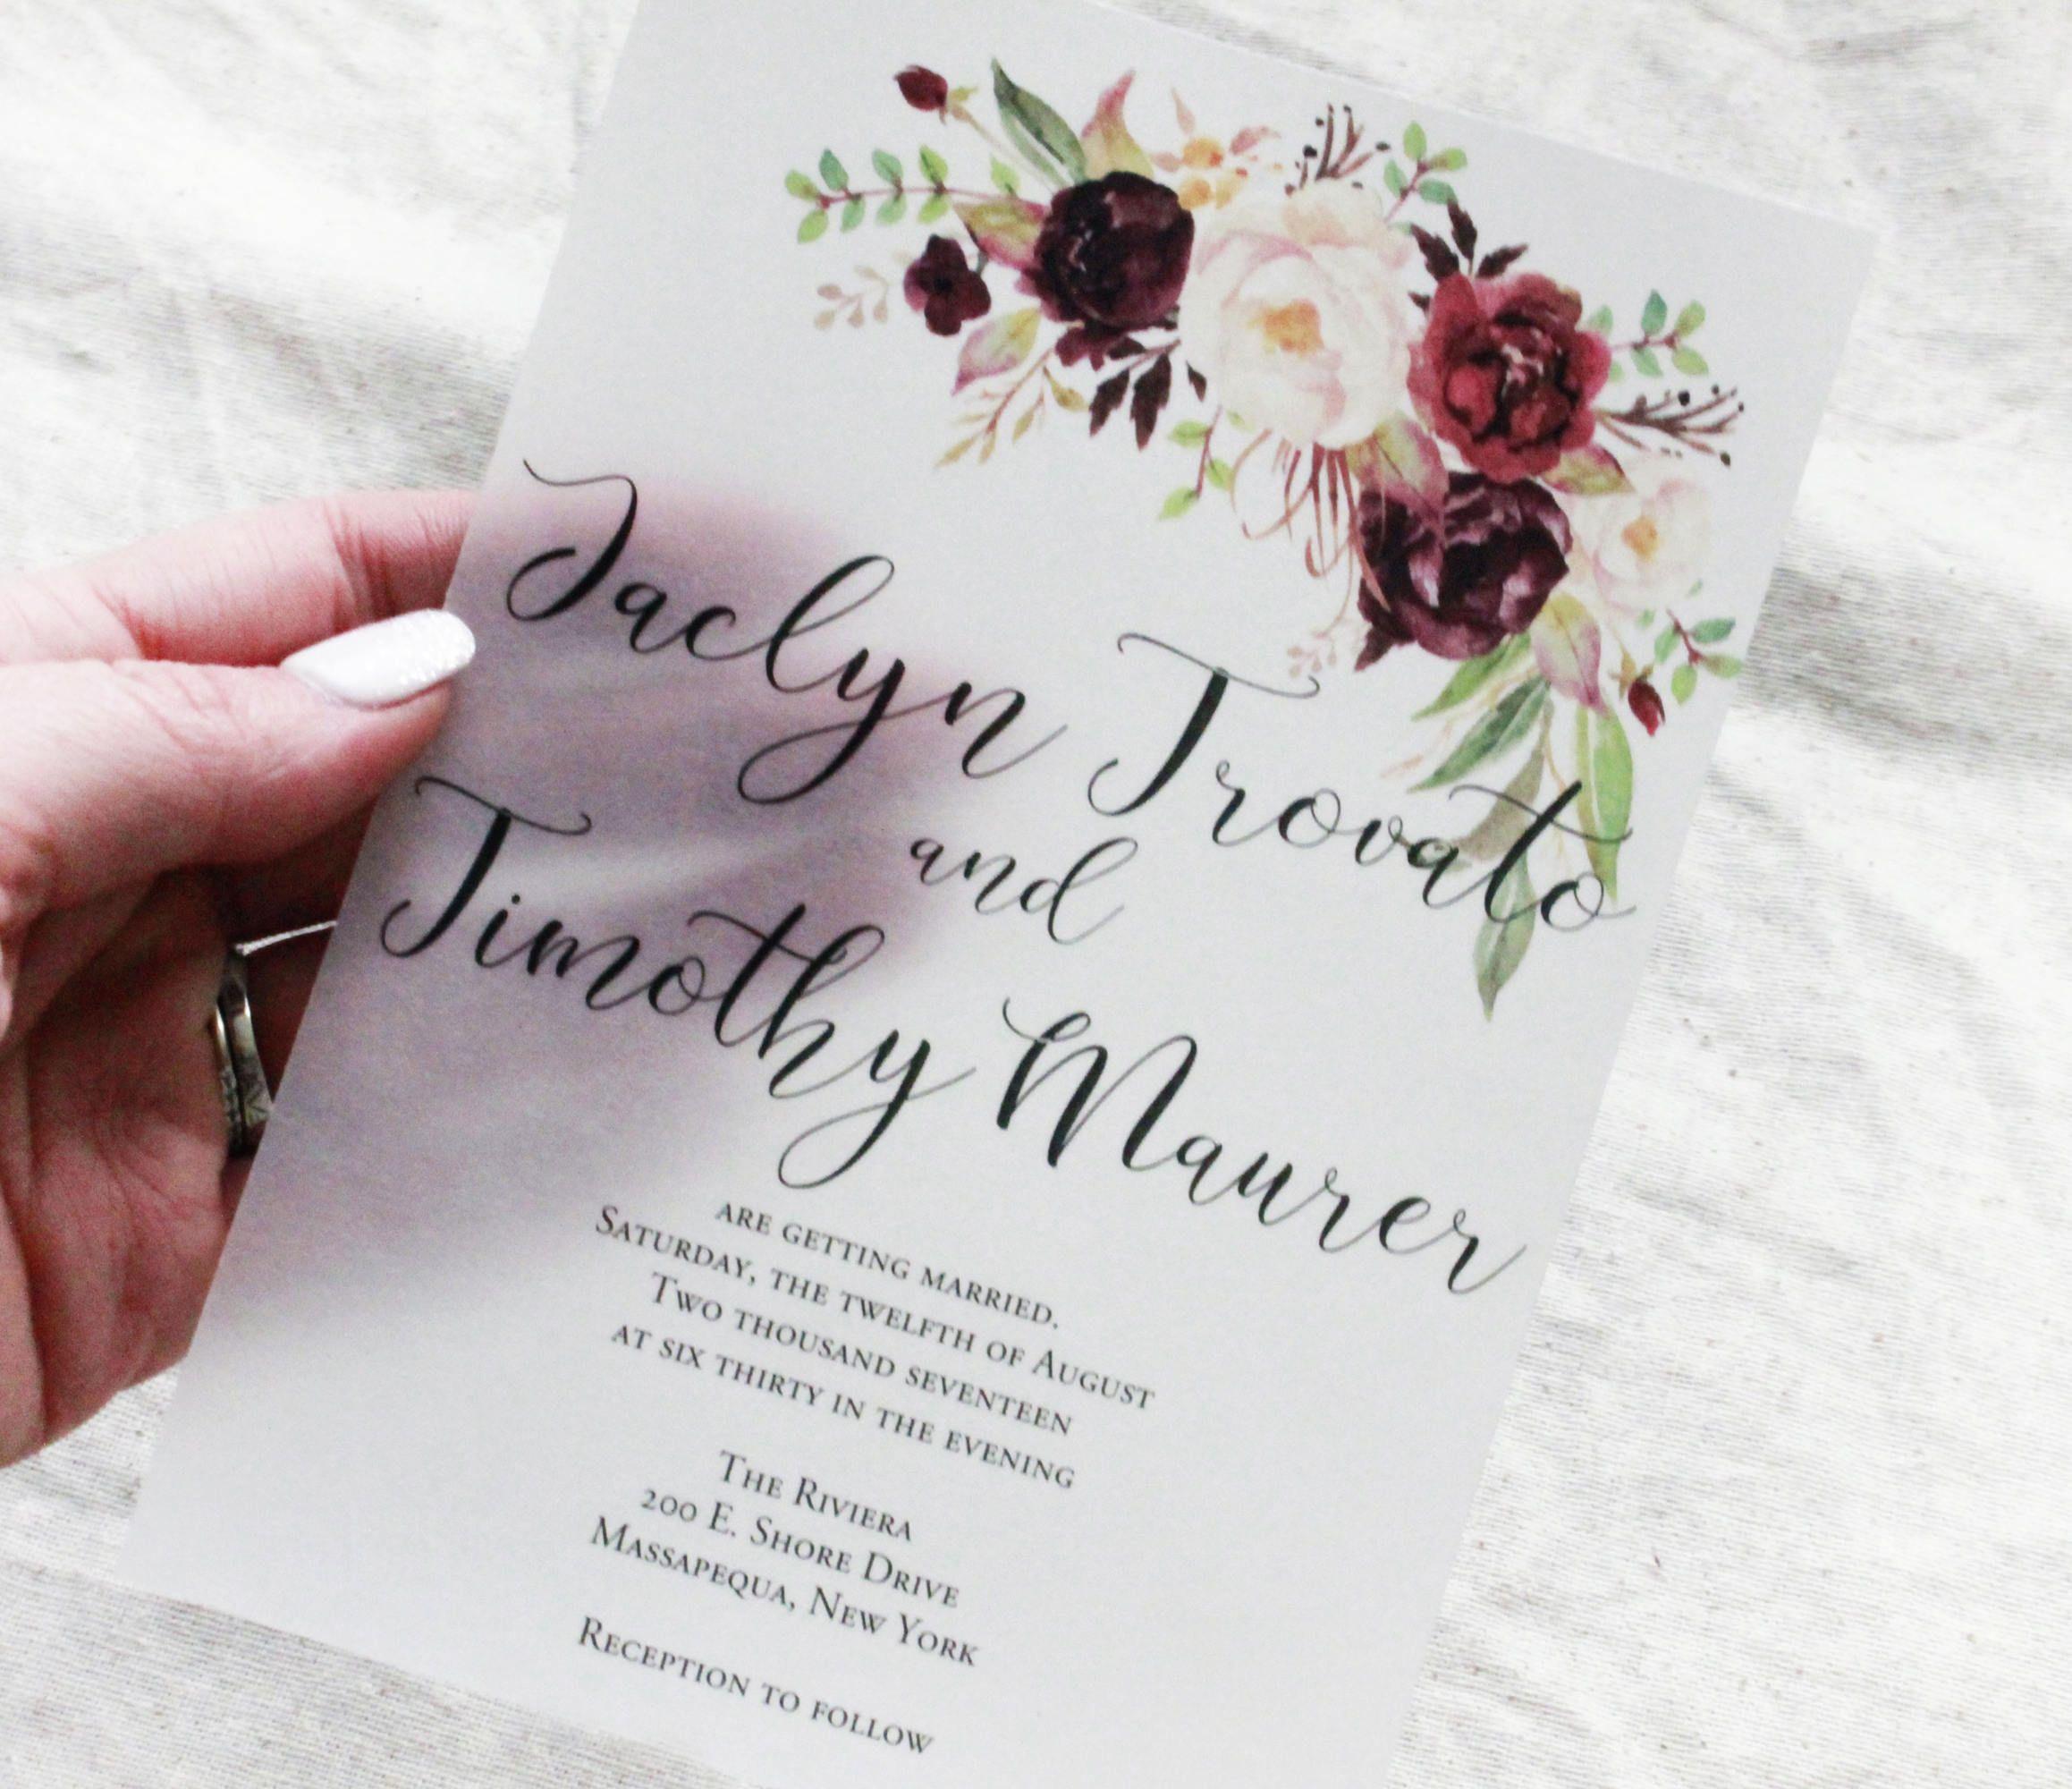 Vellum Wedding Invitation, Burgundy wedding invite, Wedding Invitation set, Unique invites, 2018 wedding trend, acrylic inspired invitation